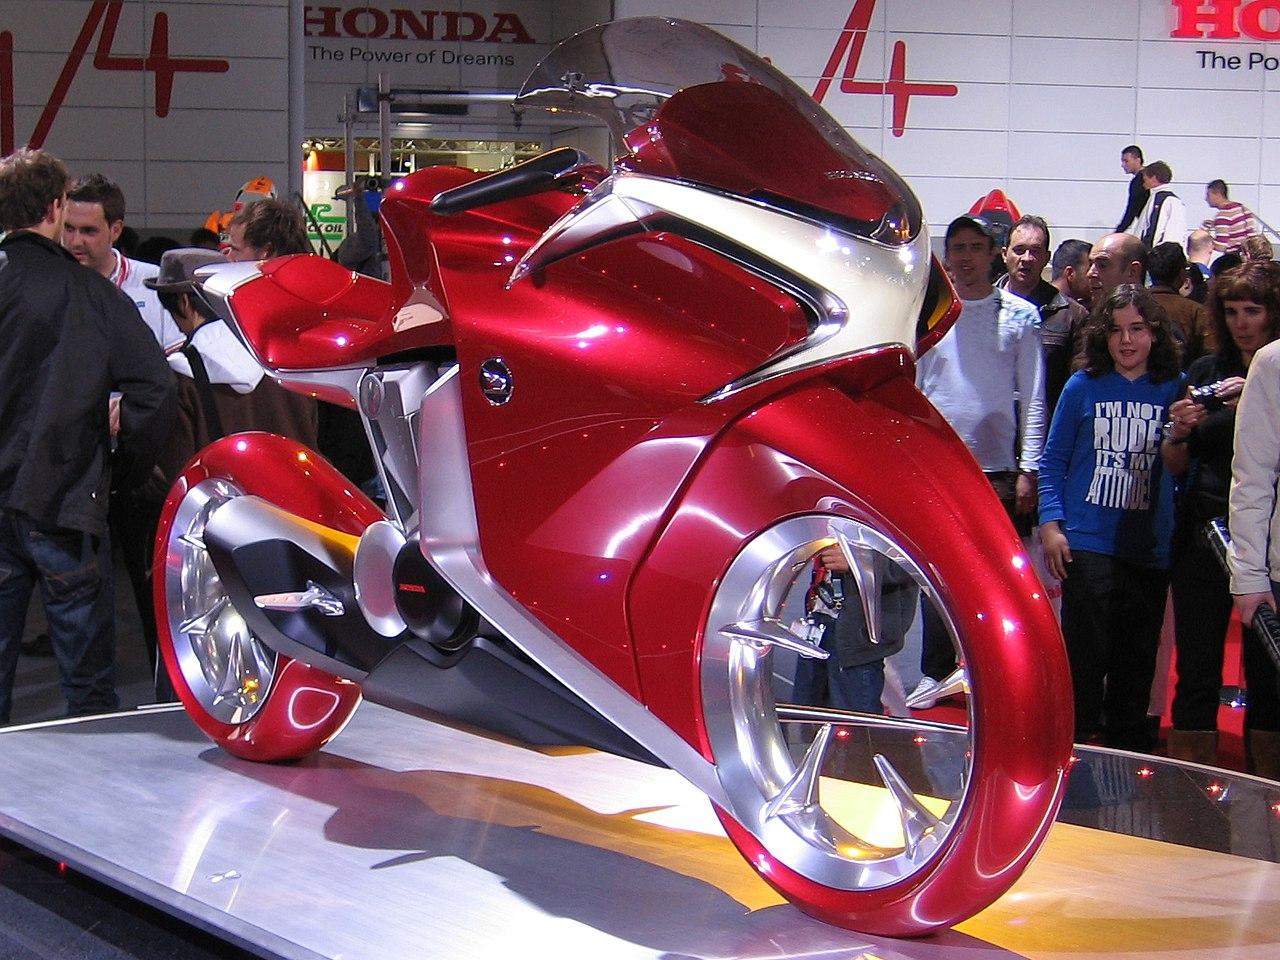 Modif Motor Kawasaki Kaze R Download